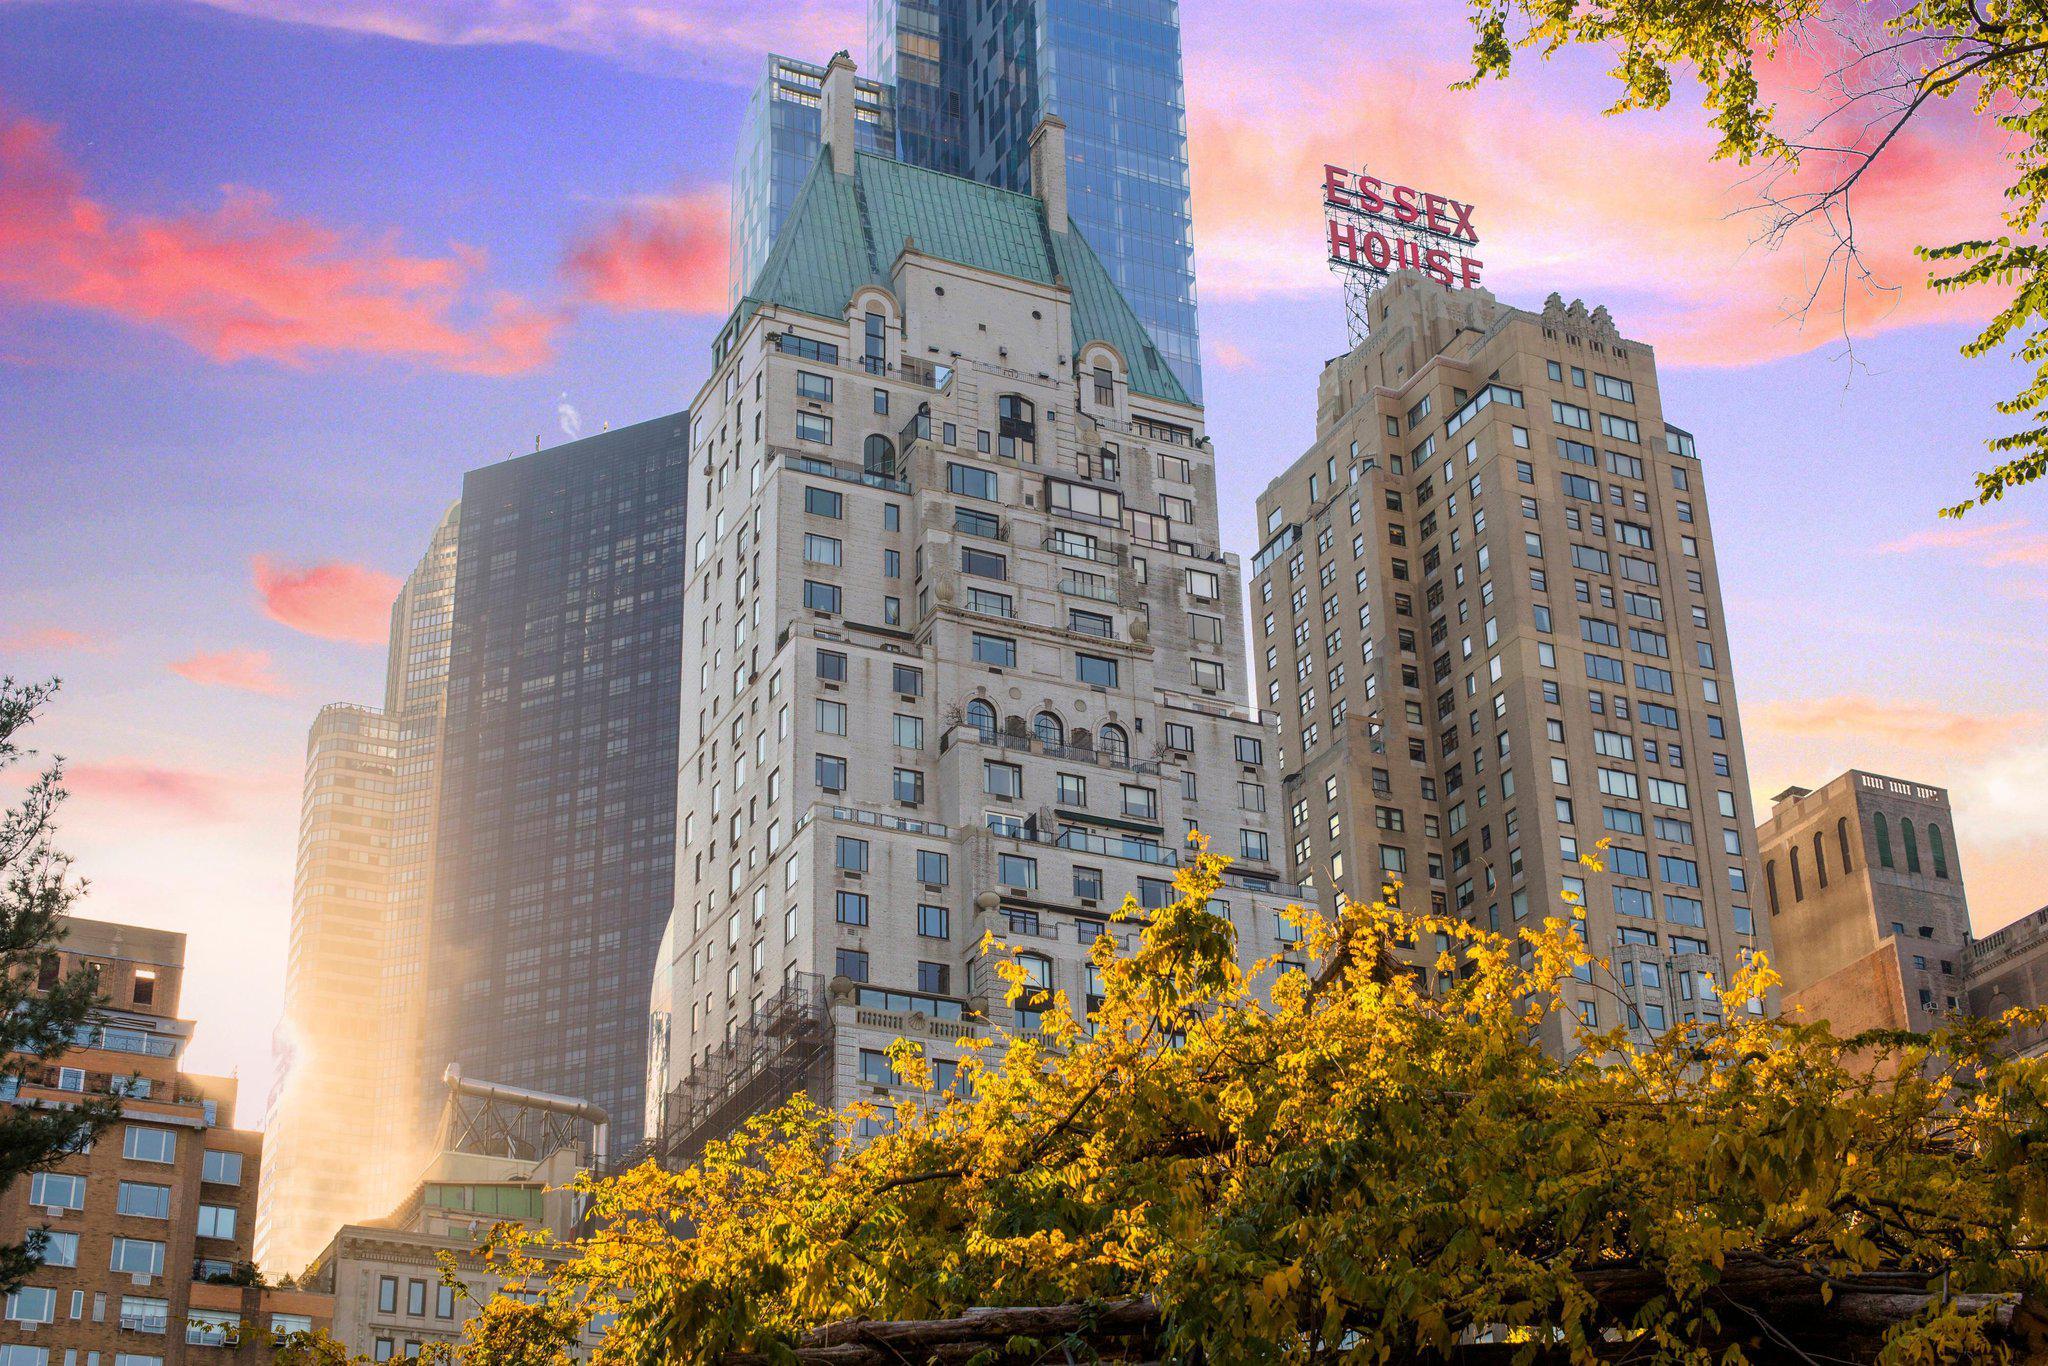 JW Marriott Essex House New York